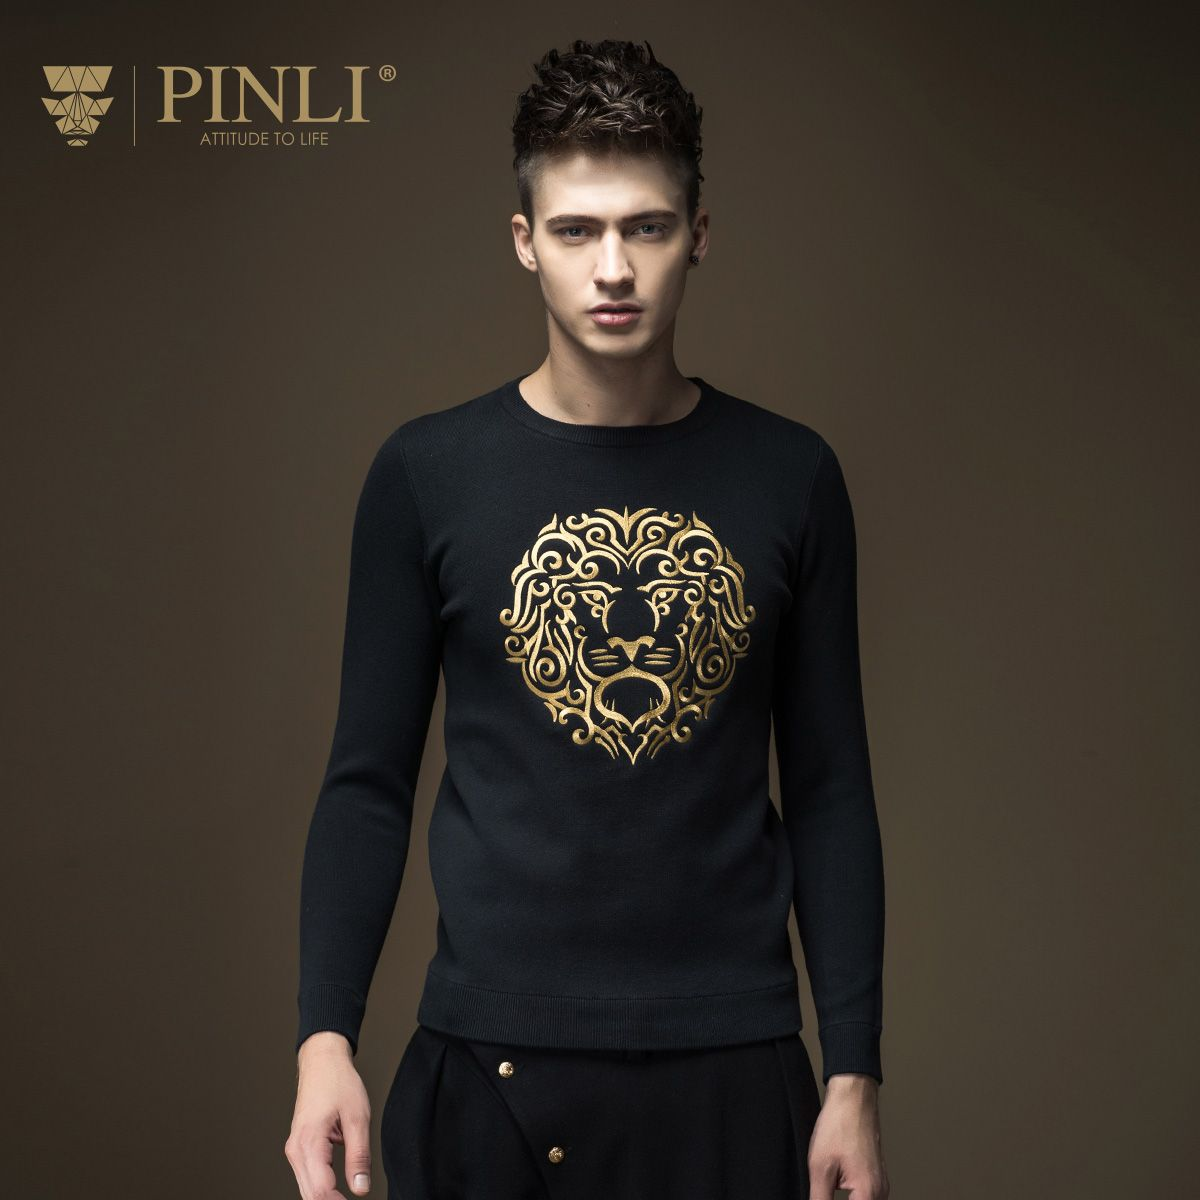 2017 Sudaderas Pullover Men Pullover Men Sale O-neck Standard Pinli Autumn New Arrival Slim Embroidered Sweater Male B16321625